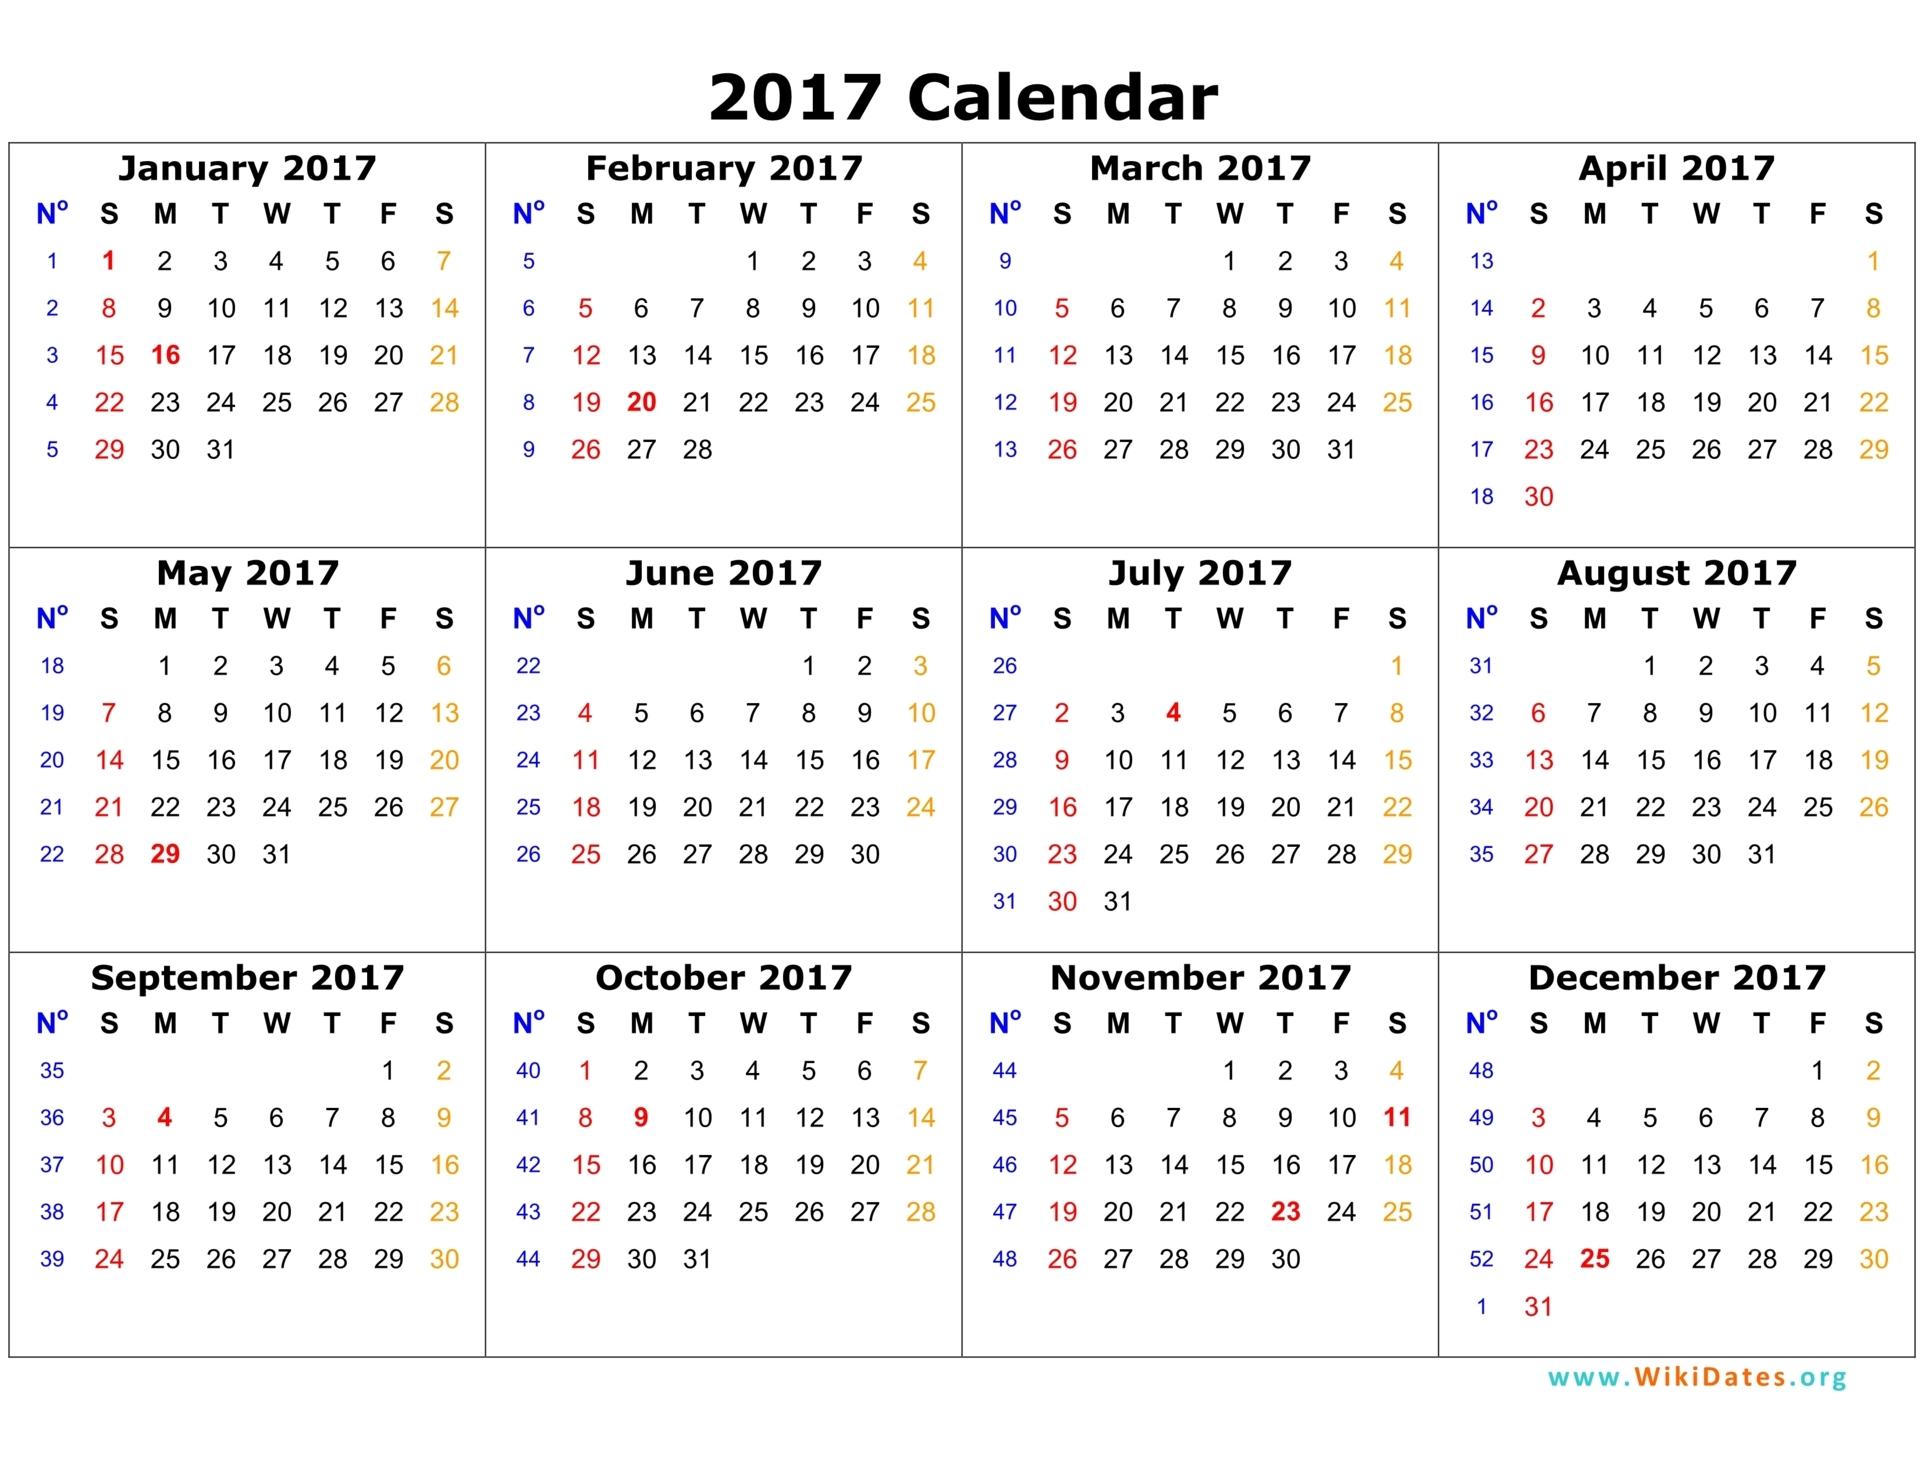 General Meeting Schedule -